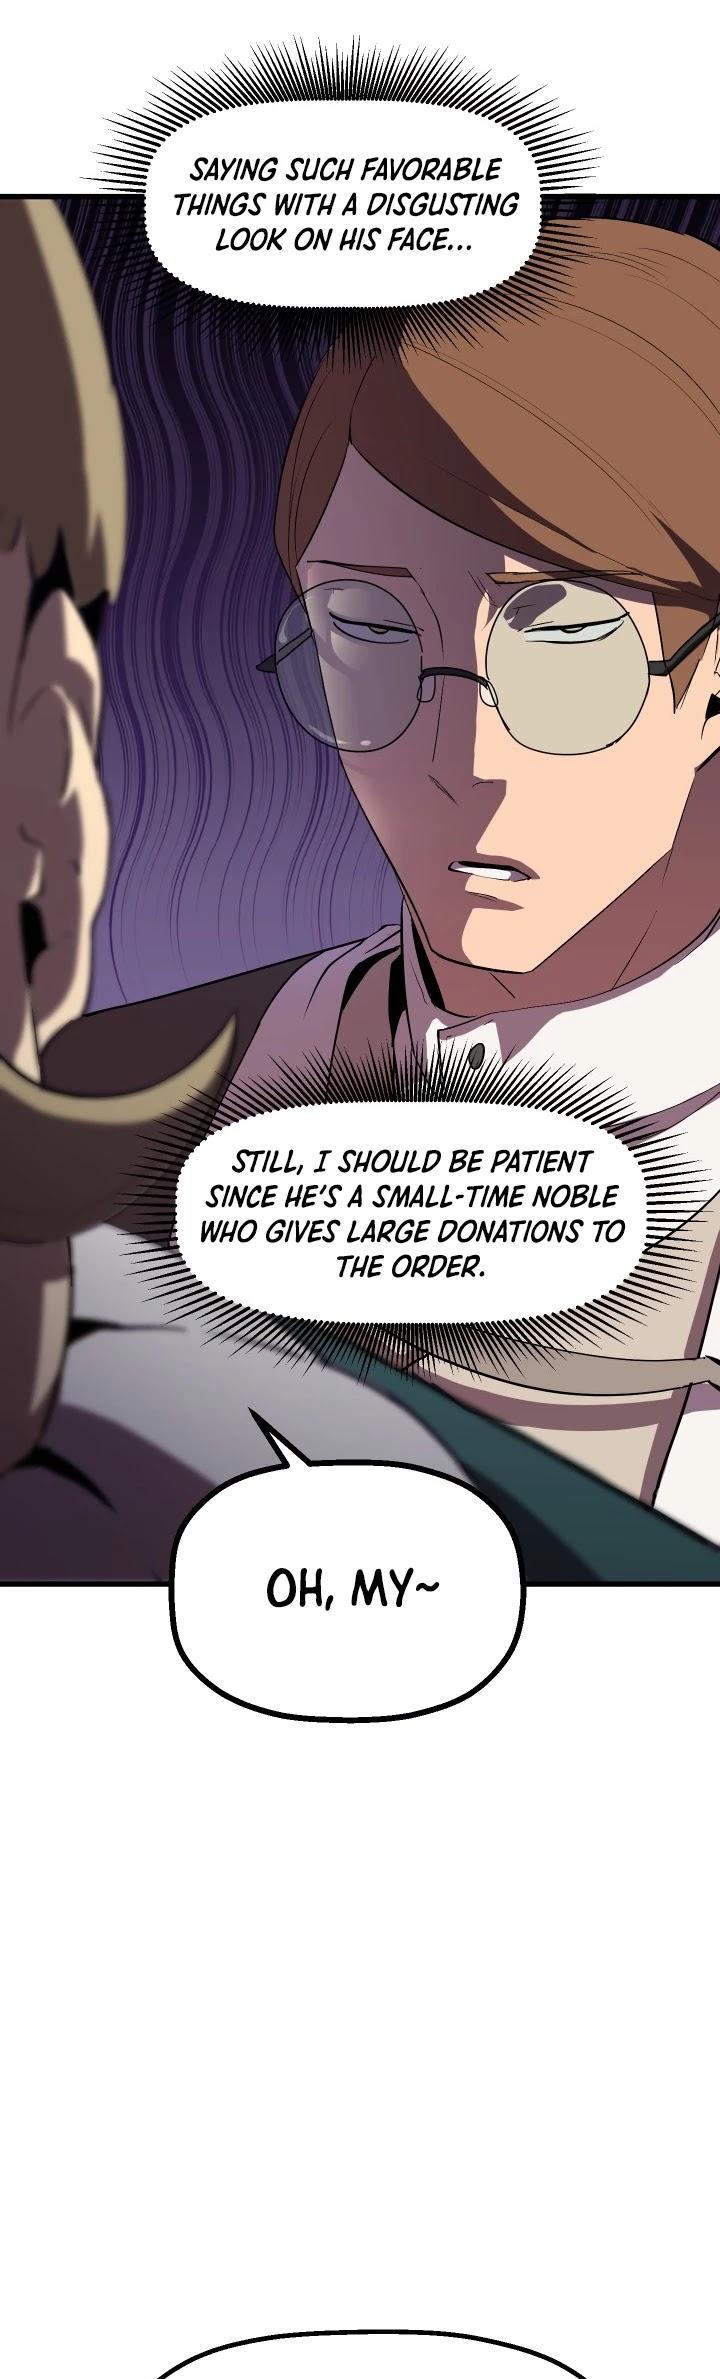 Survival Story Of A Sword King In A Fantasy World Chapter 52 page 6 - Mangakakalots.com